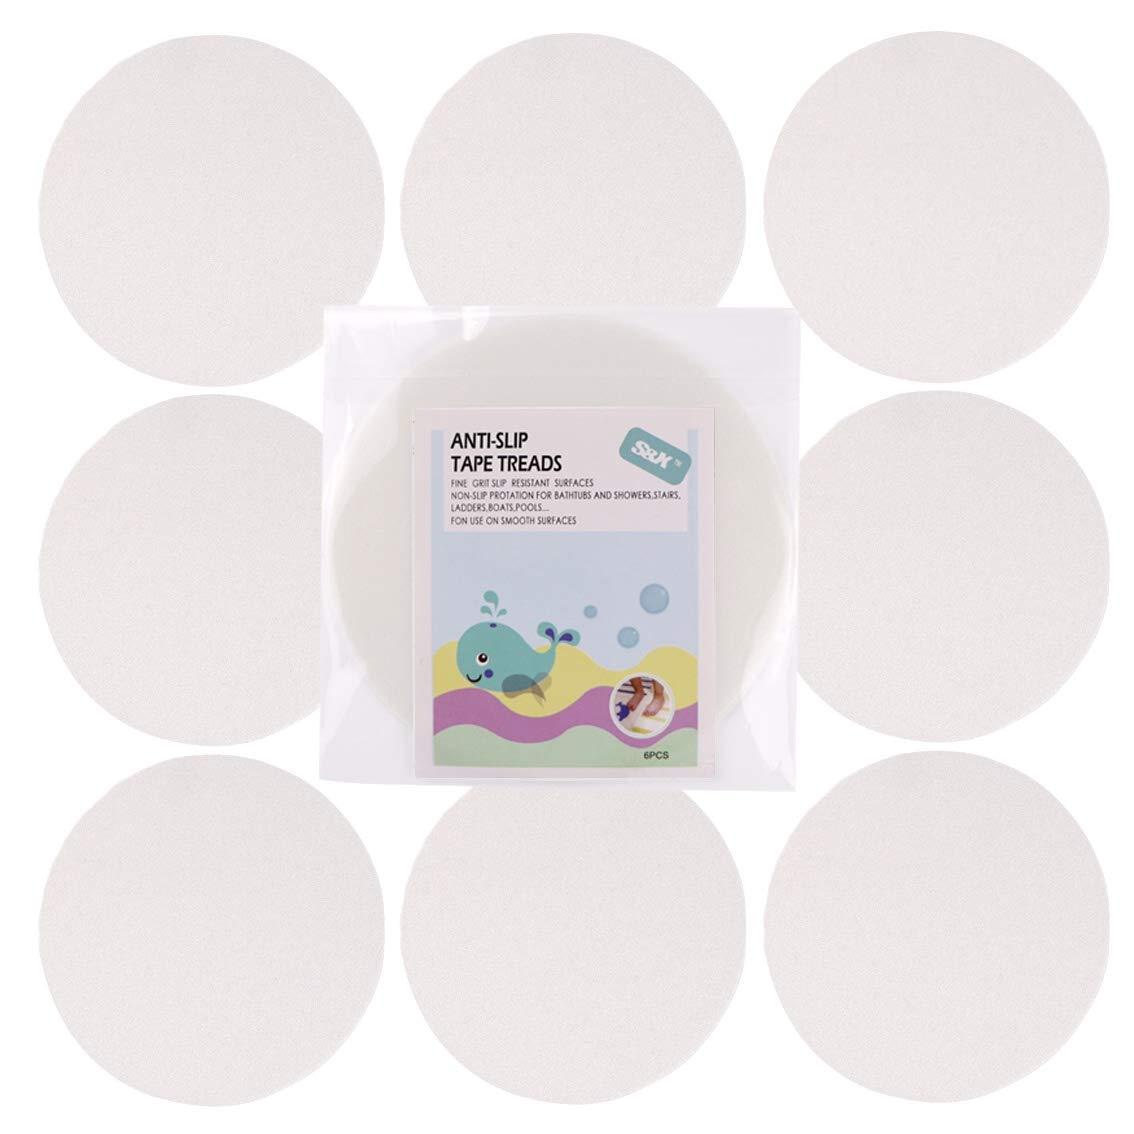 S& X Bath Stickers Non Slip Grit Sticker Slip-Resistant Baby Bathtub Shower Tattoos Anti Slip Safety Strips Strong Adhesive Safety Sticker for Bathtub/Pools/Bathrooms/Staris (5x5)